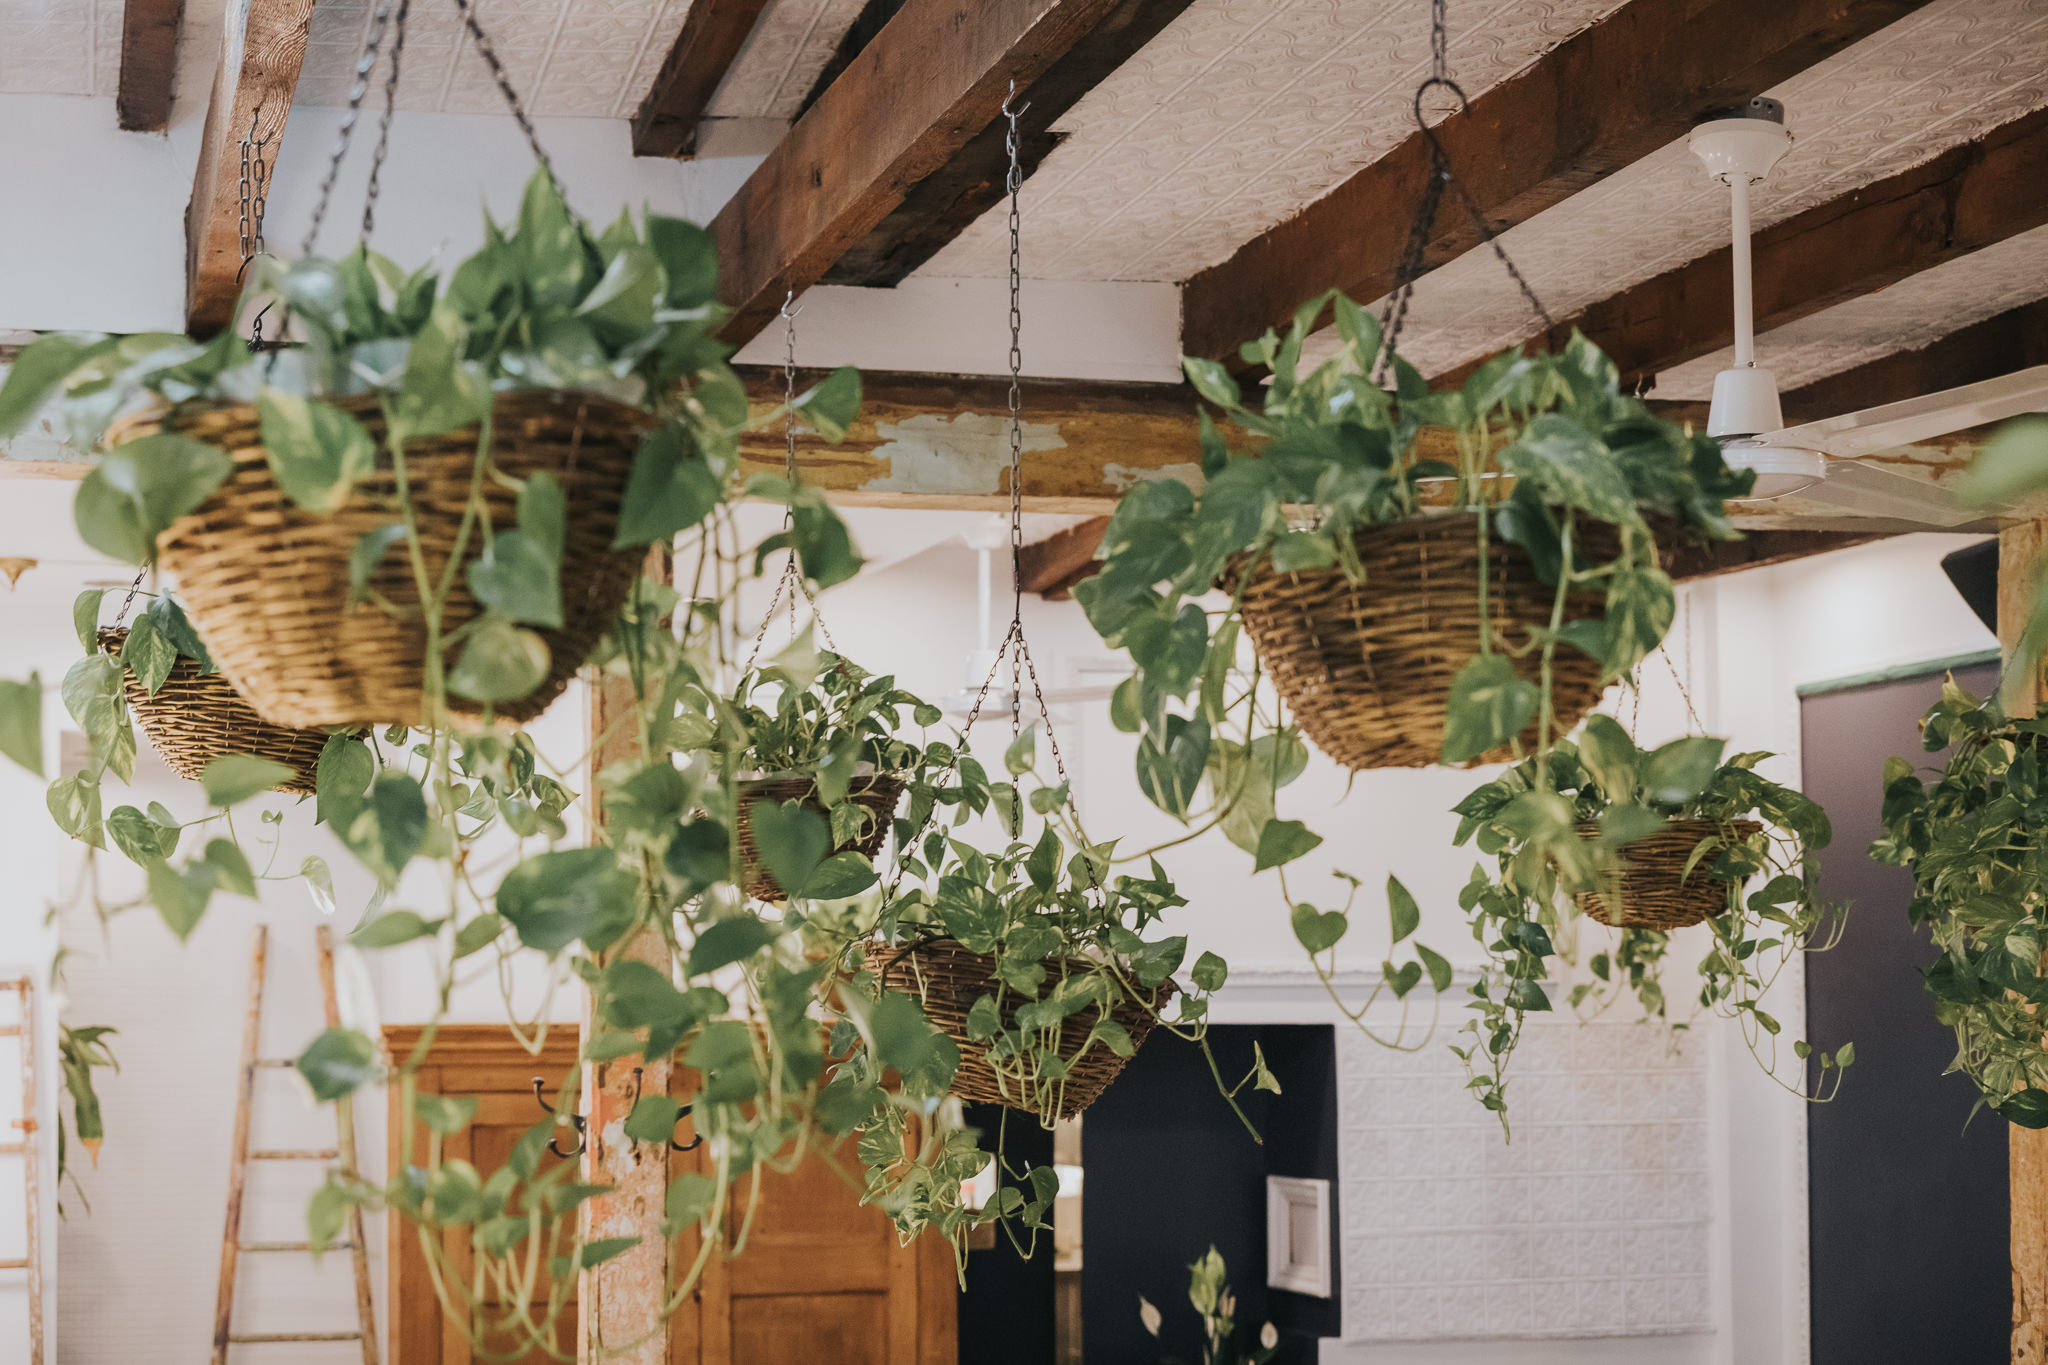 montreal - decor - plants.jpg